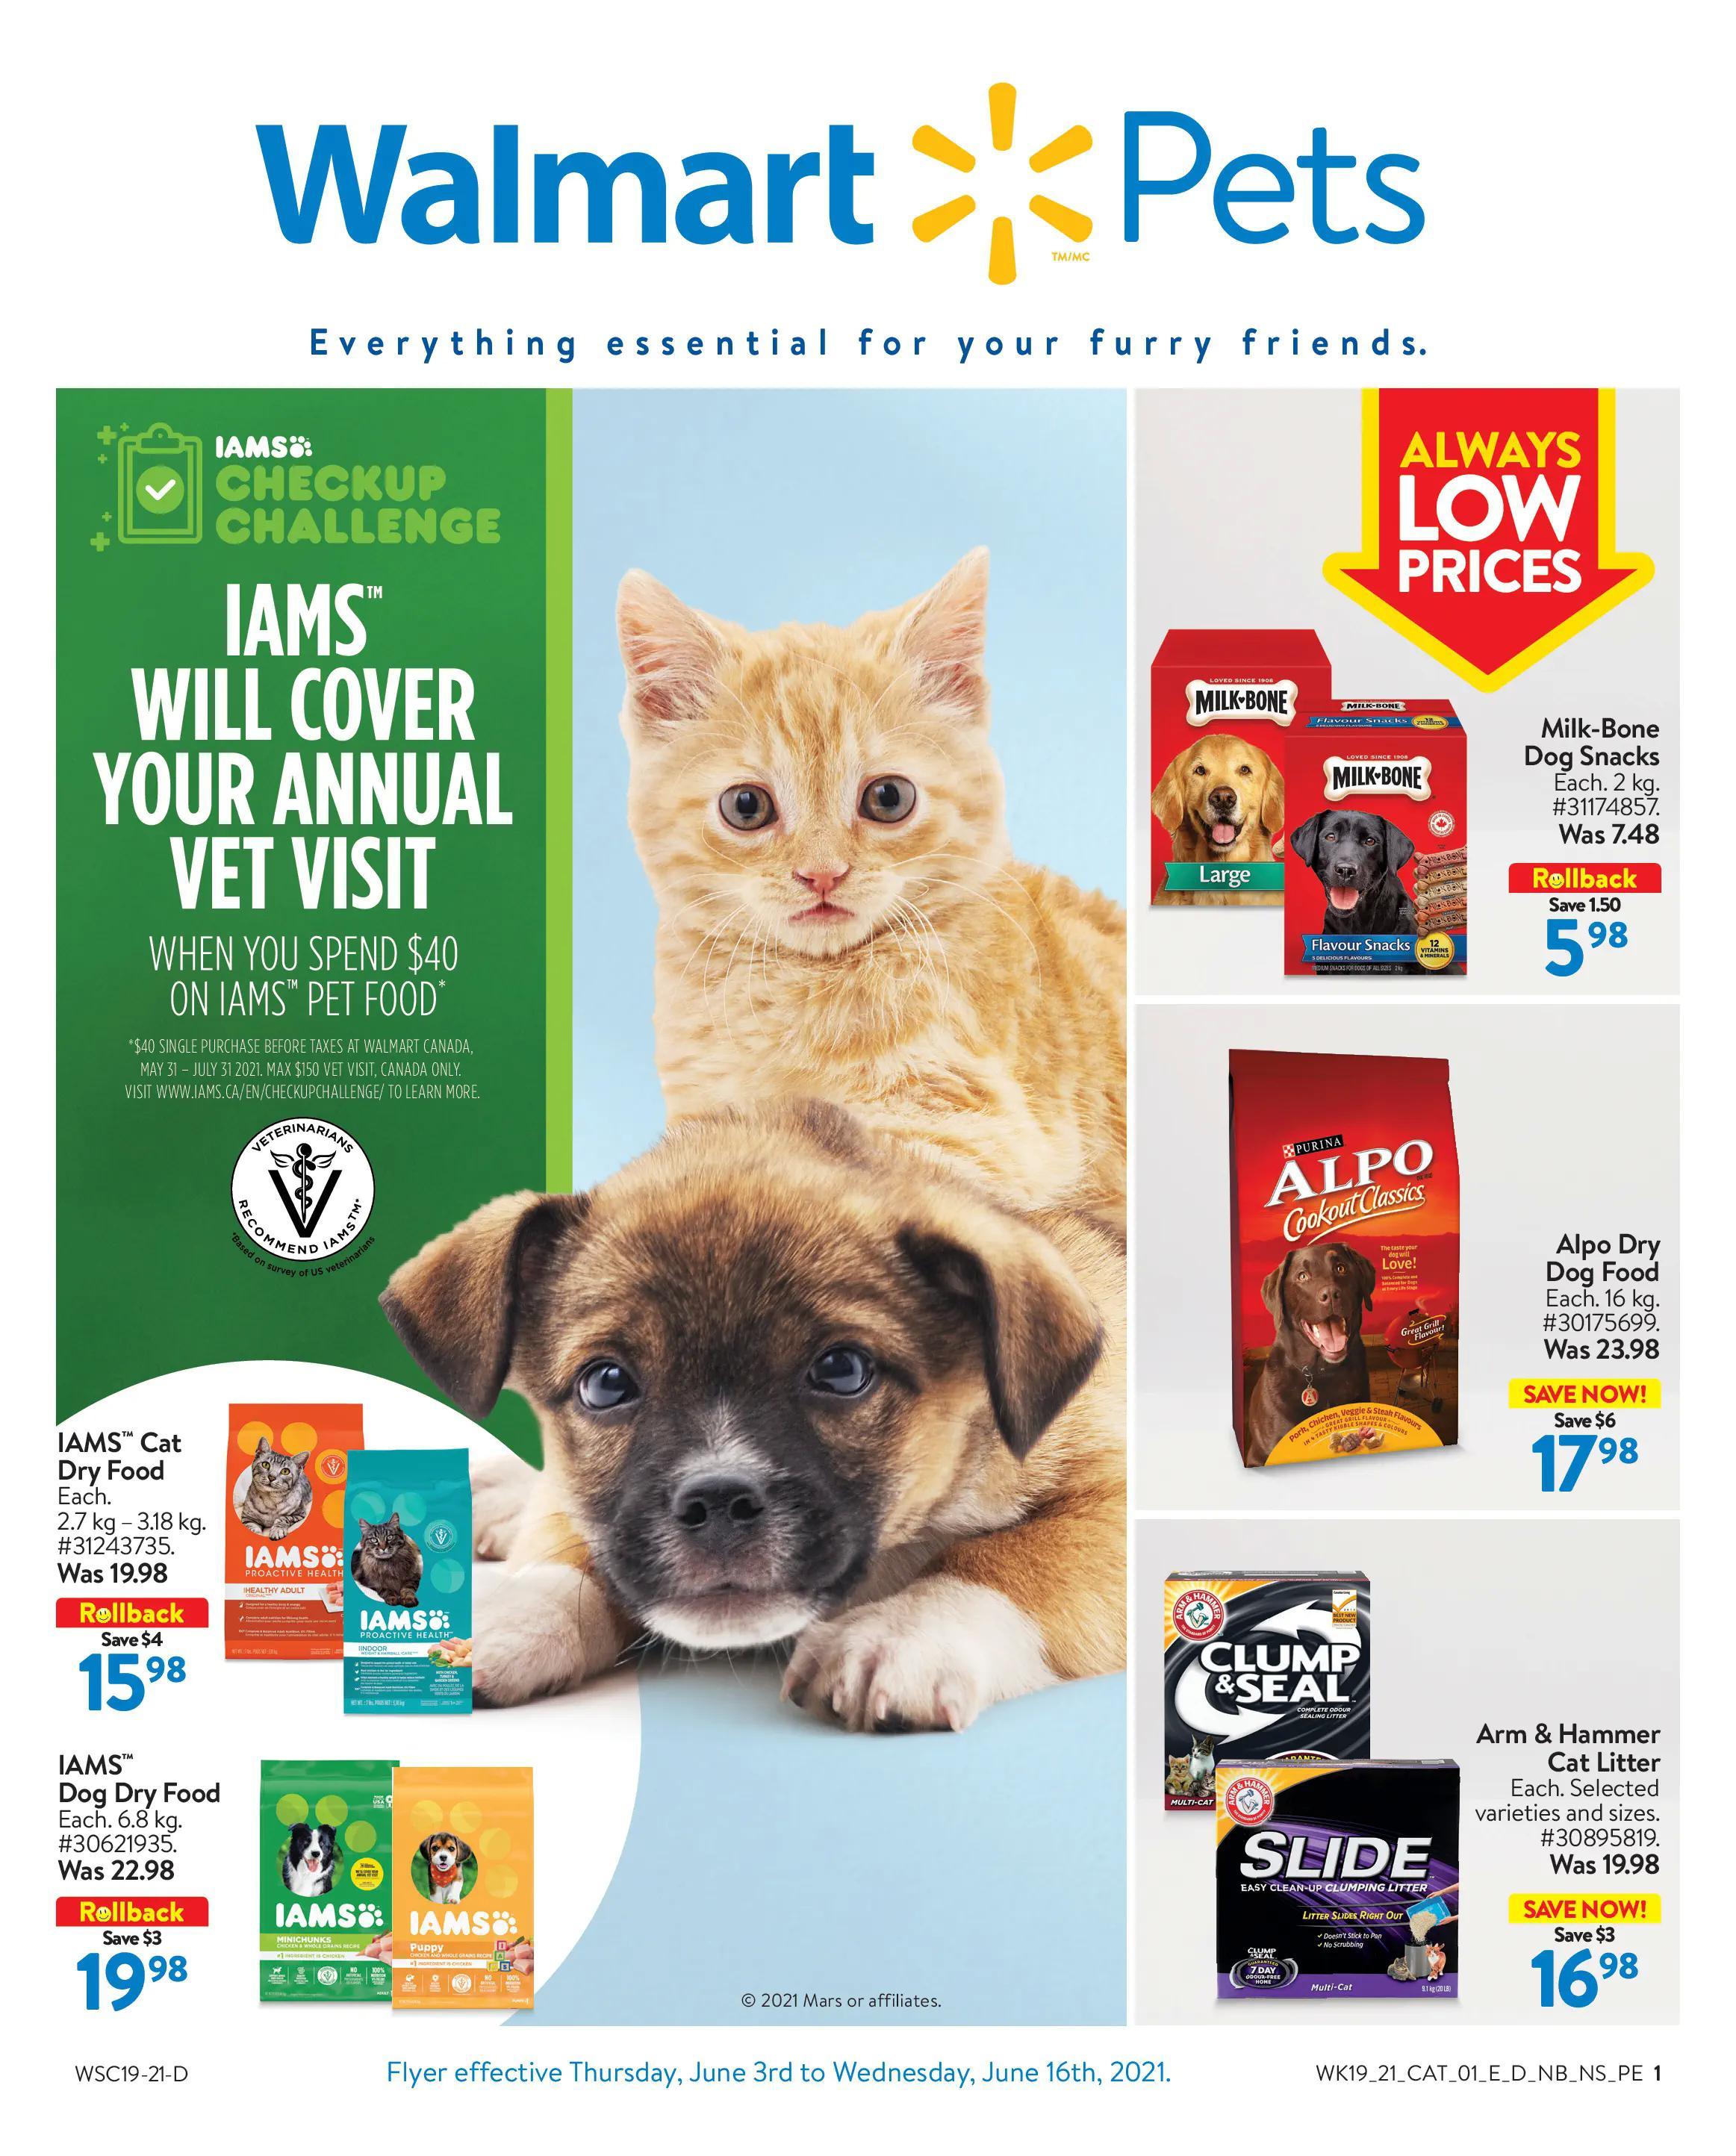 Walmart - Pets